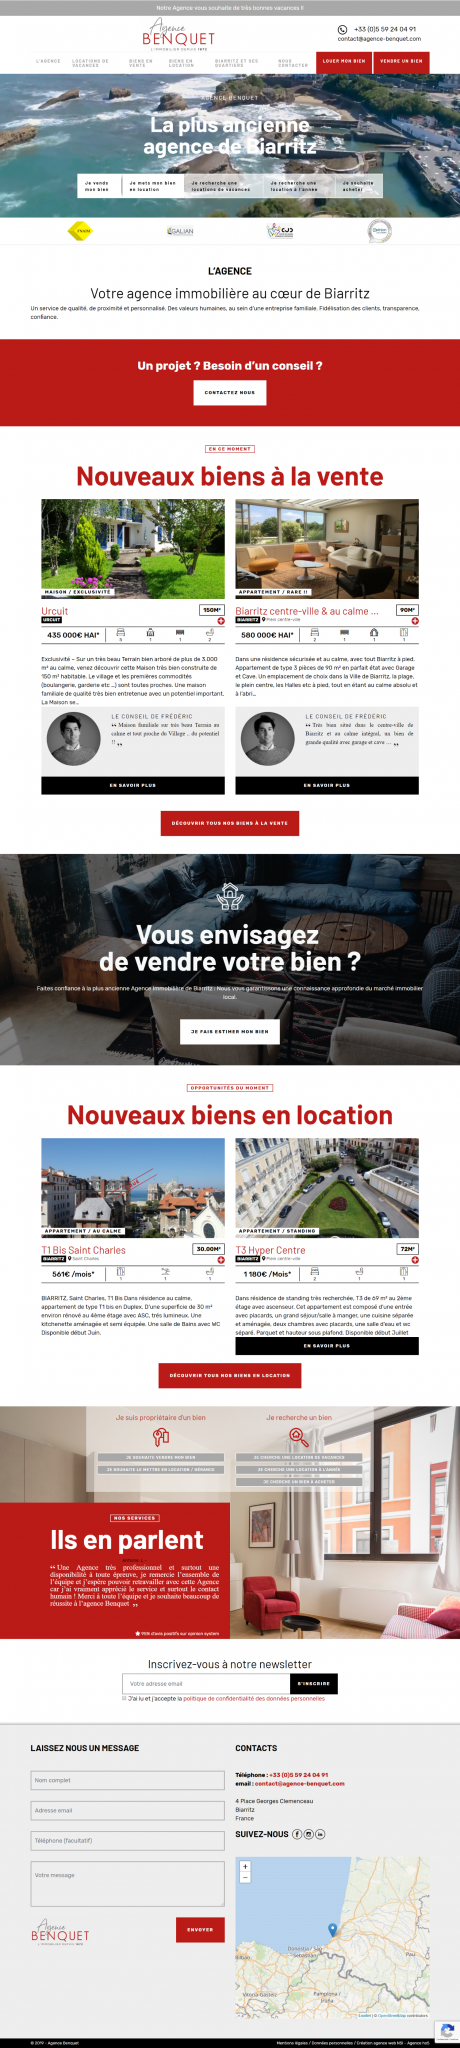 site internet benquet immobilier